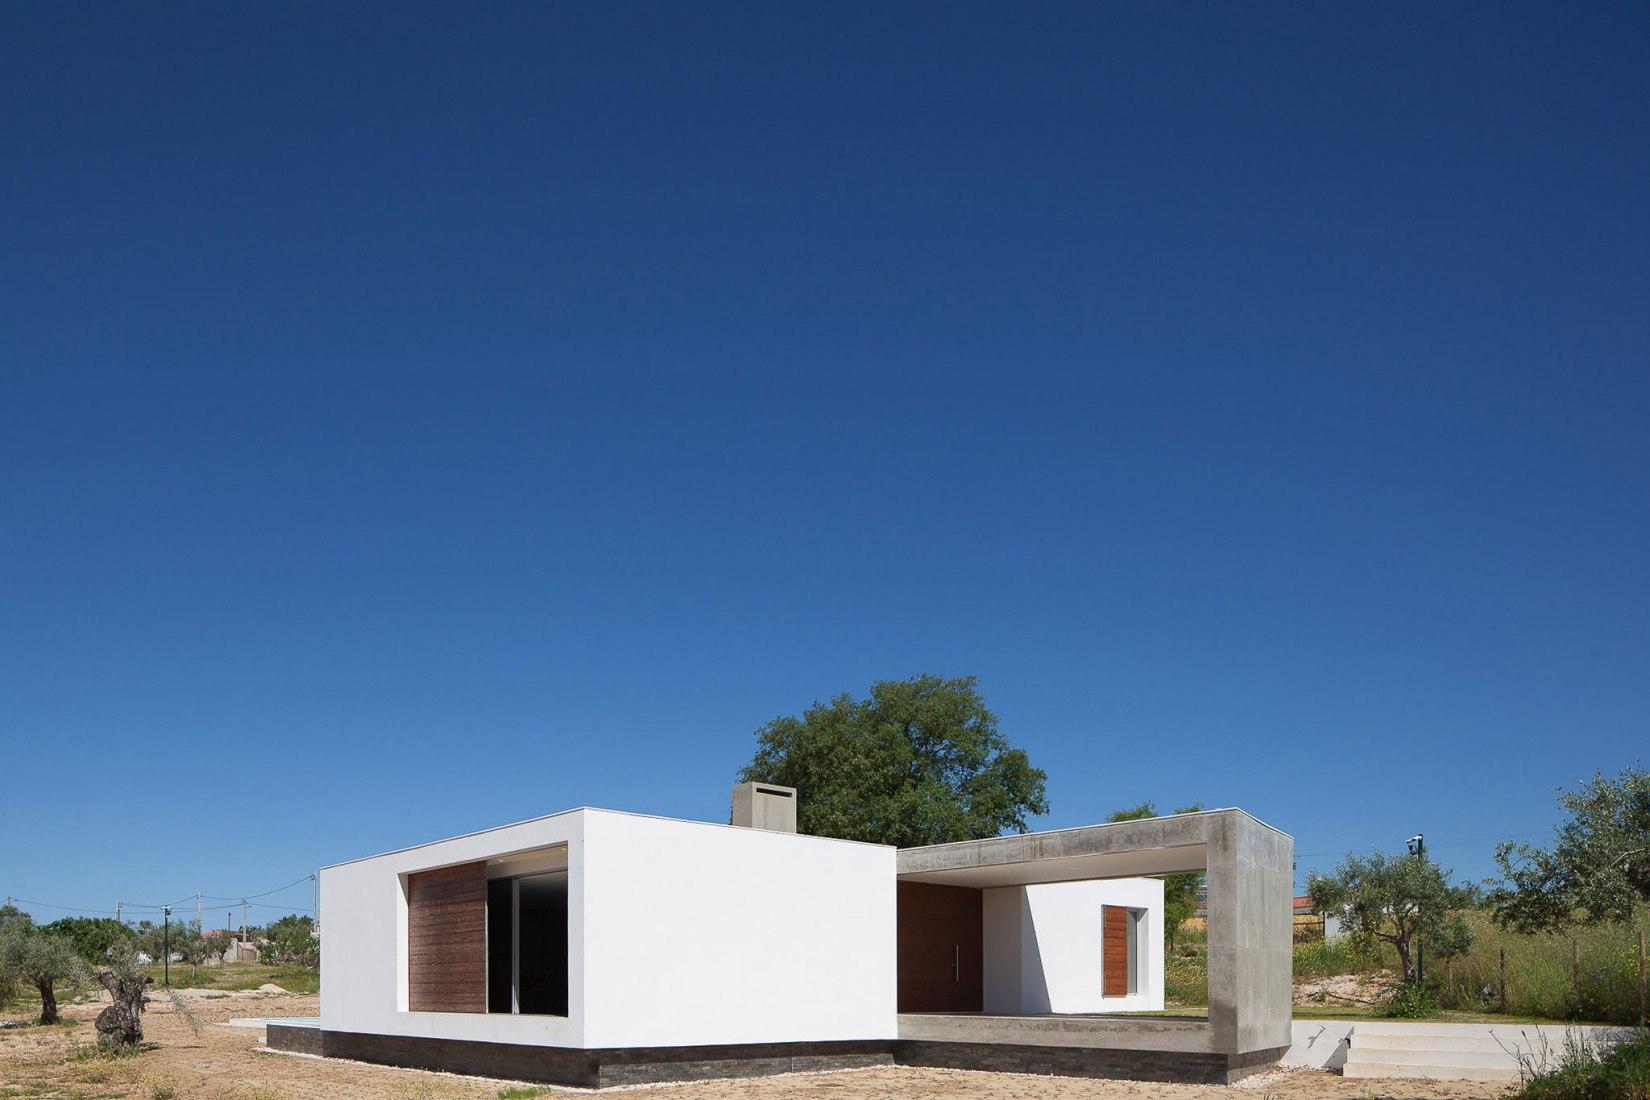 Exterior. Ring House by Vasco Cabral + Sofia Saraiva  Architects. Photograph © José Campos